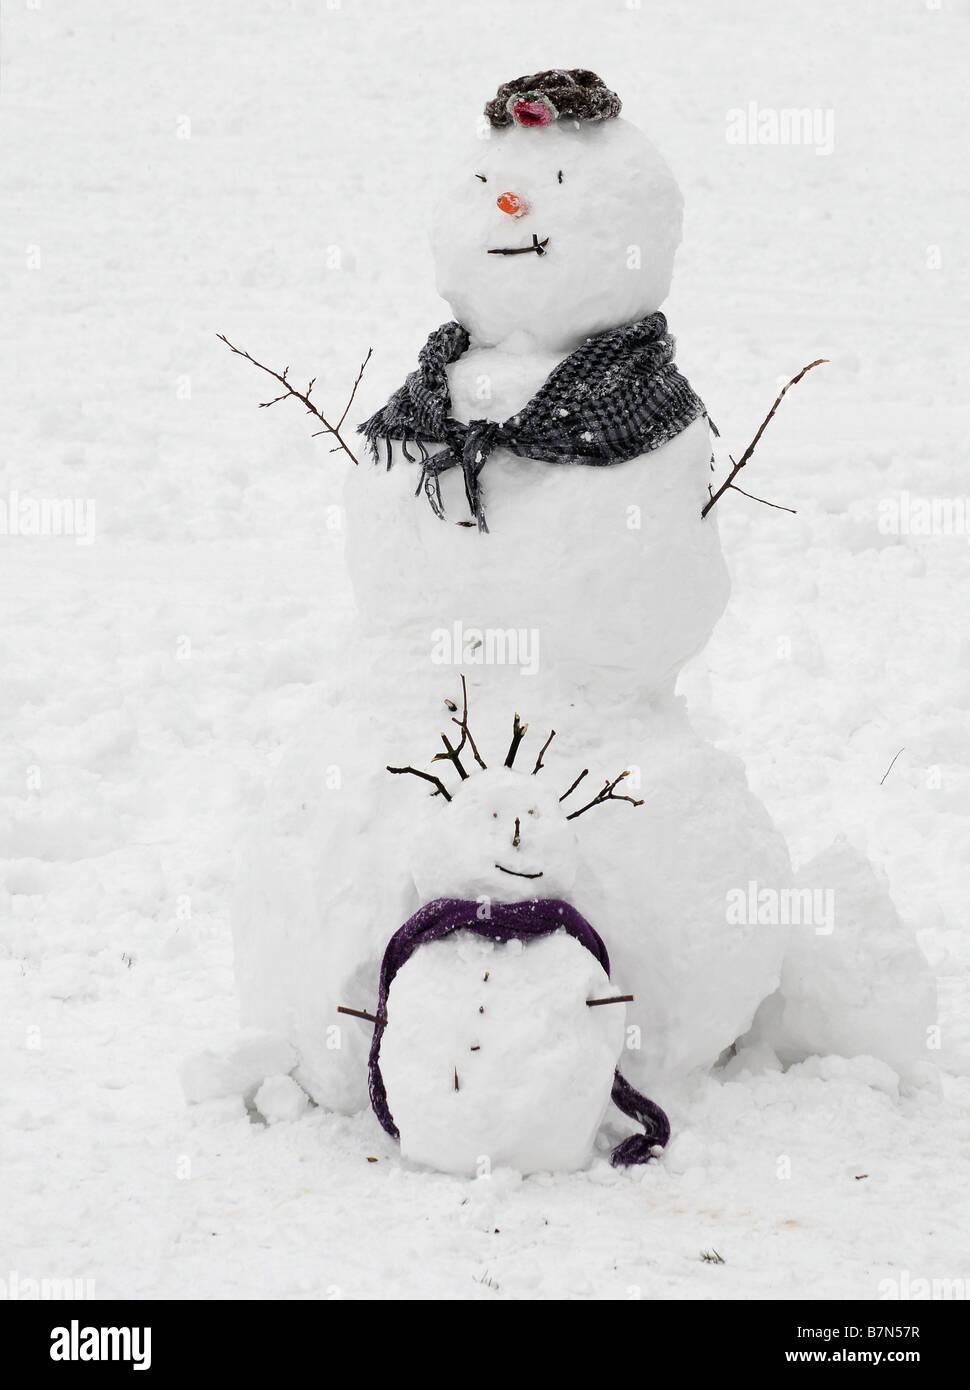 Two snowmen - Stock Image